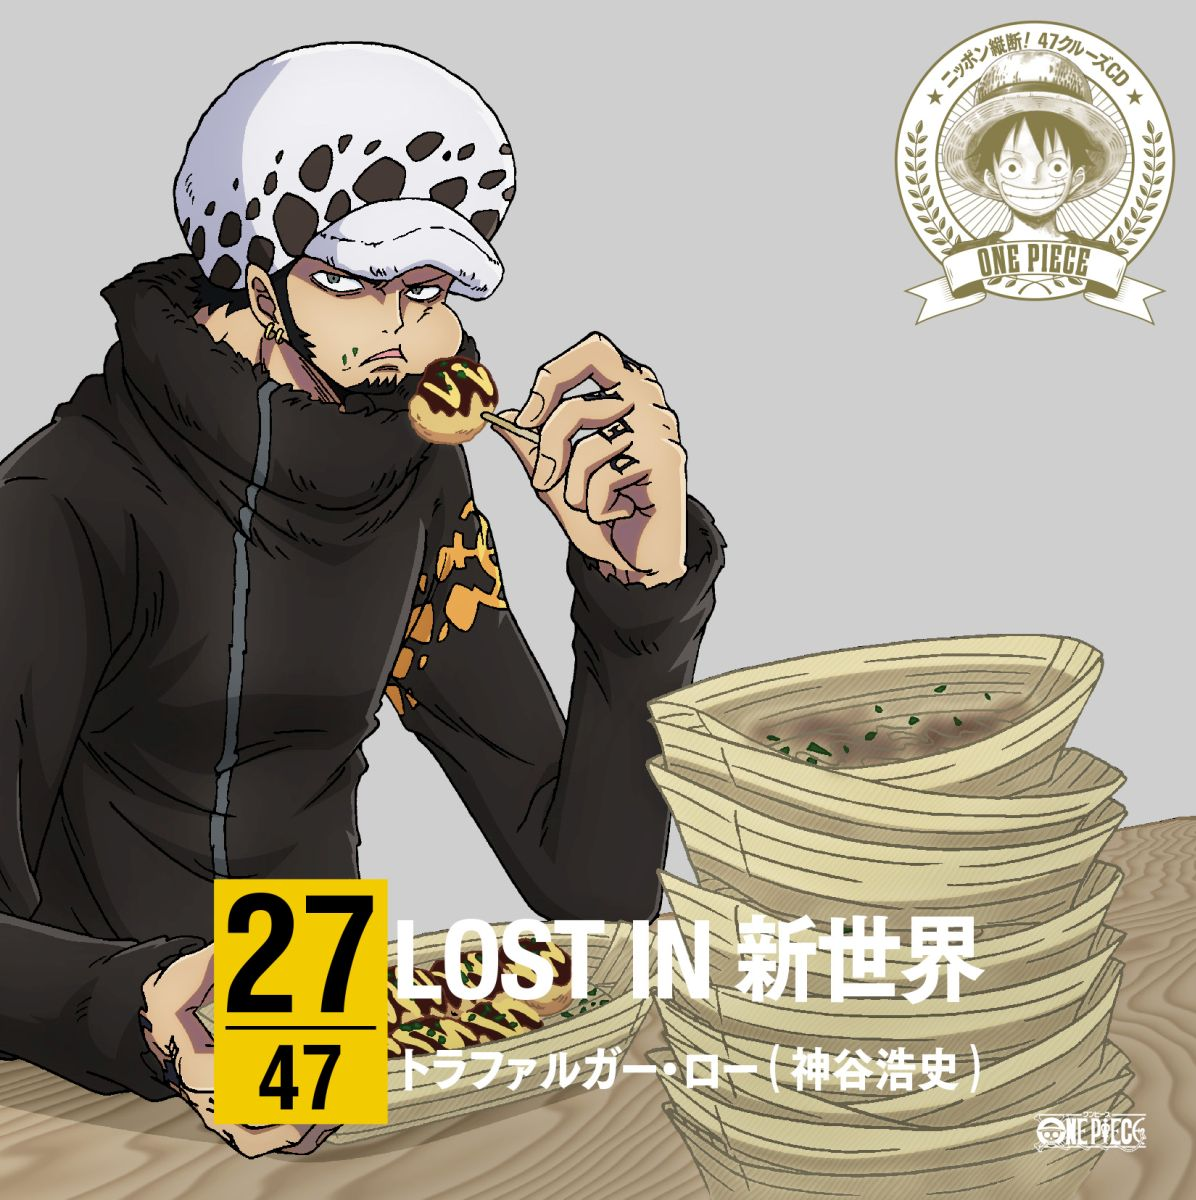 ONE PIECE ニッポン縦断! 47クルーズCD in 大阪 LOST IN 新世界画像